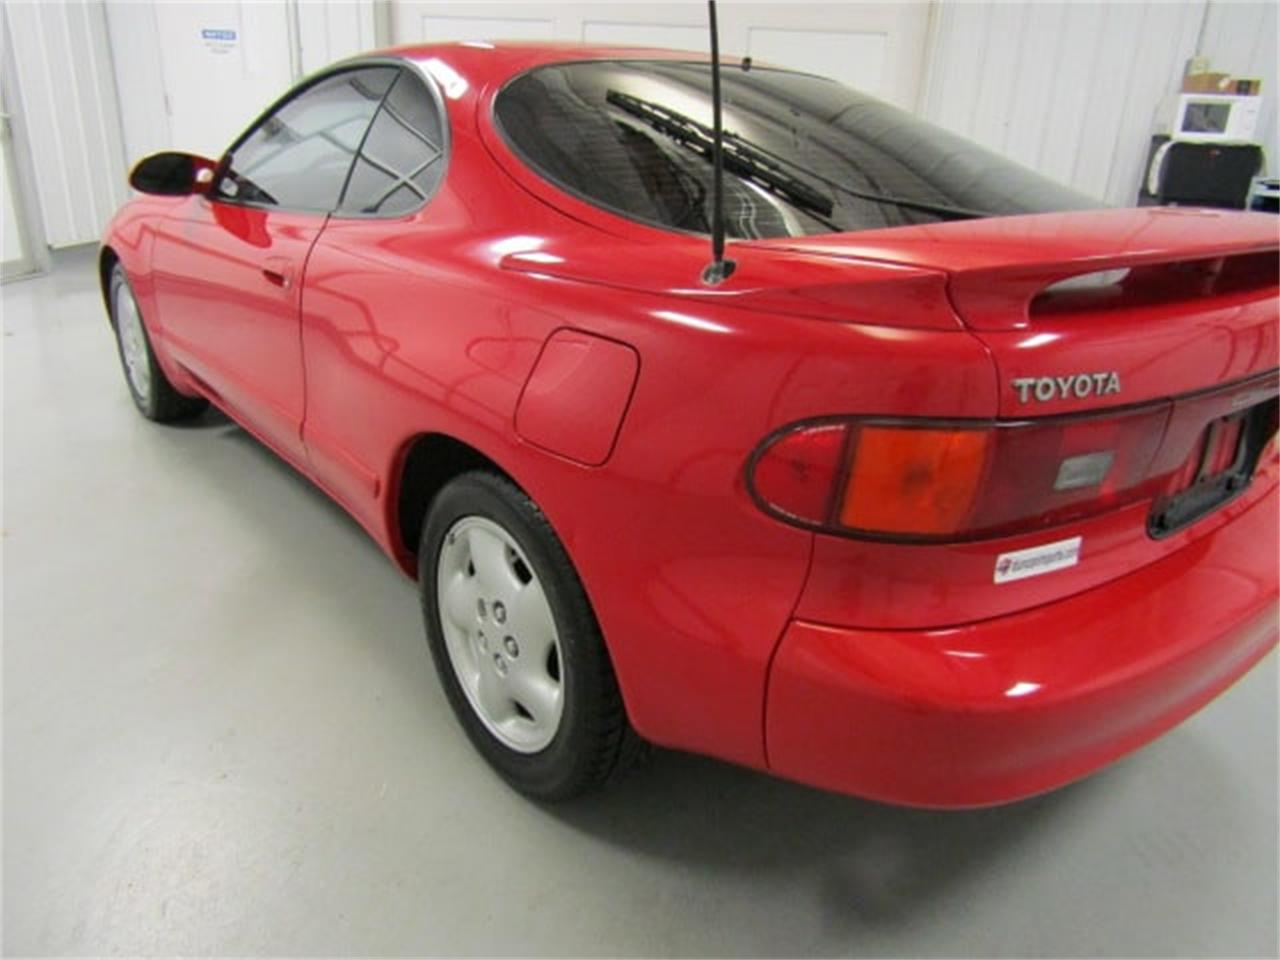 Large Picture of '90 Celica - $7,918.00 - LI31